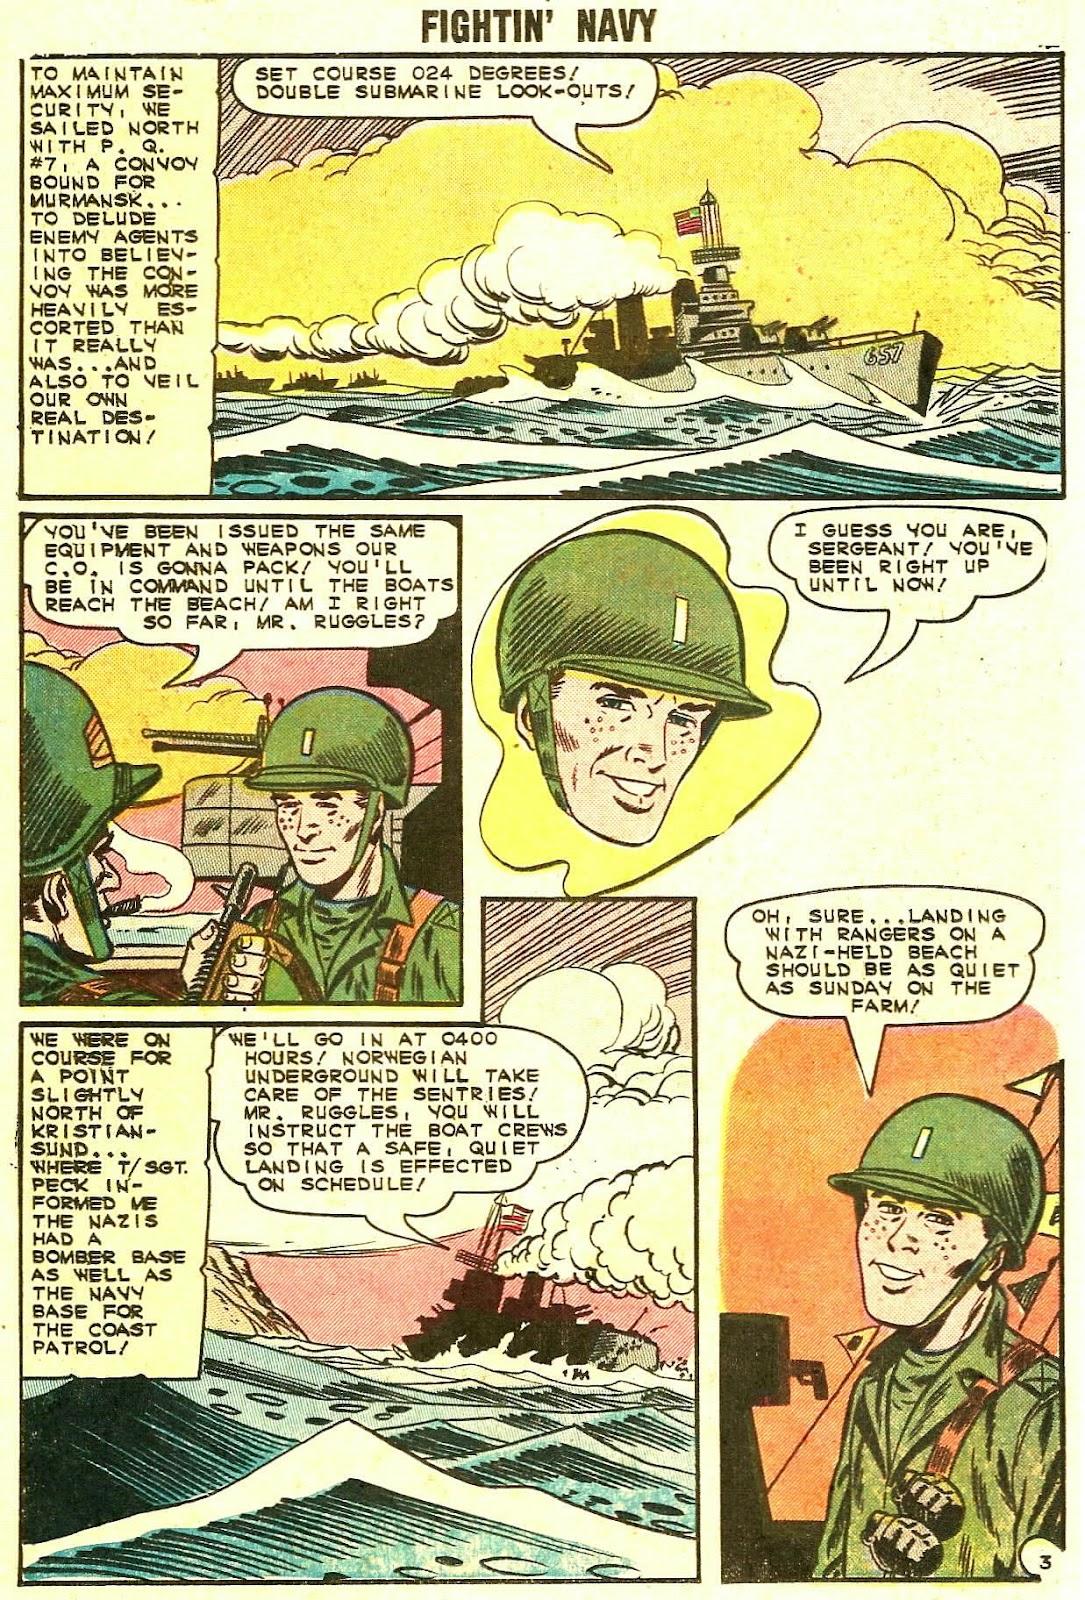 Read online Fightin' Navy comic -  Issue #119 - 14